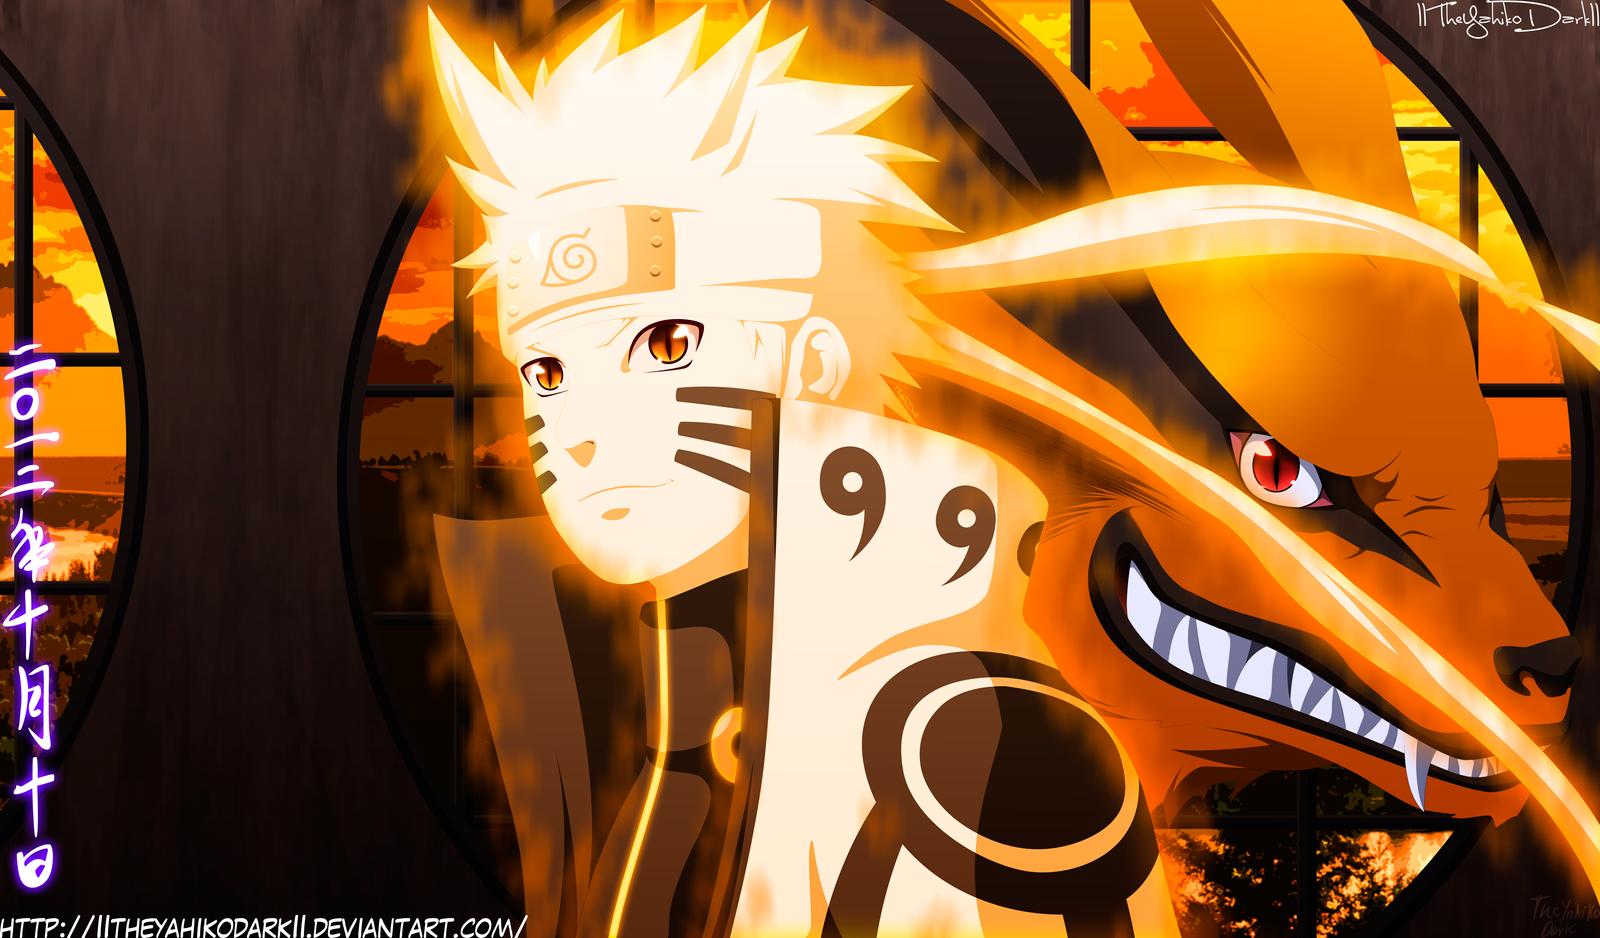 Imagens de Naruto  Naruto_and_kurama_we_will_be_the_bes_by_iitheyahikodarkii-d5kd9w2